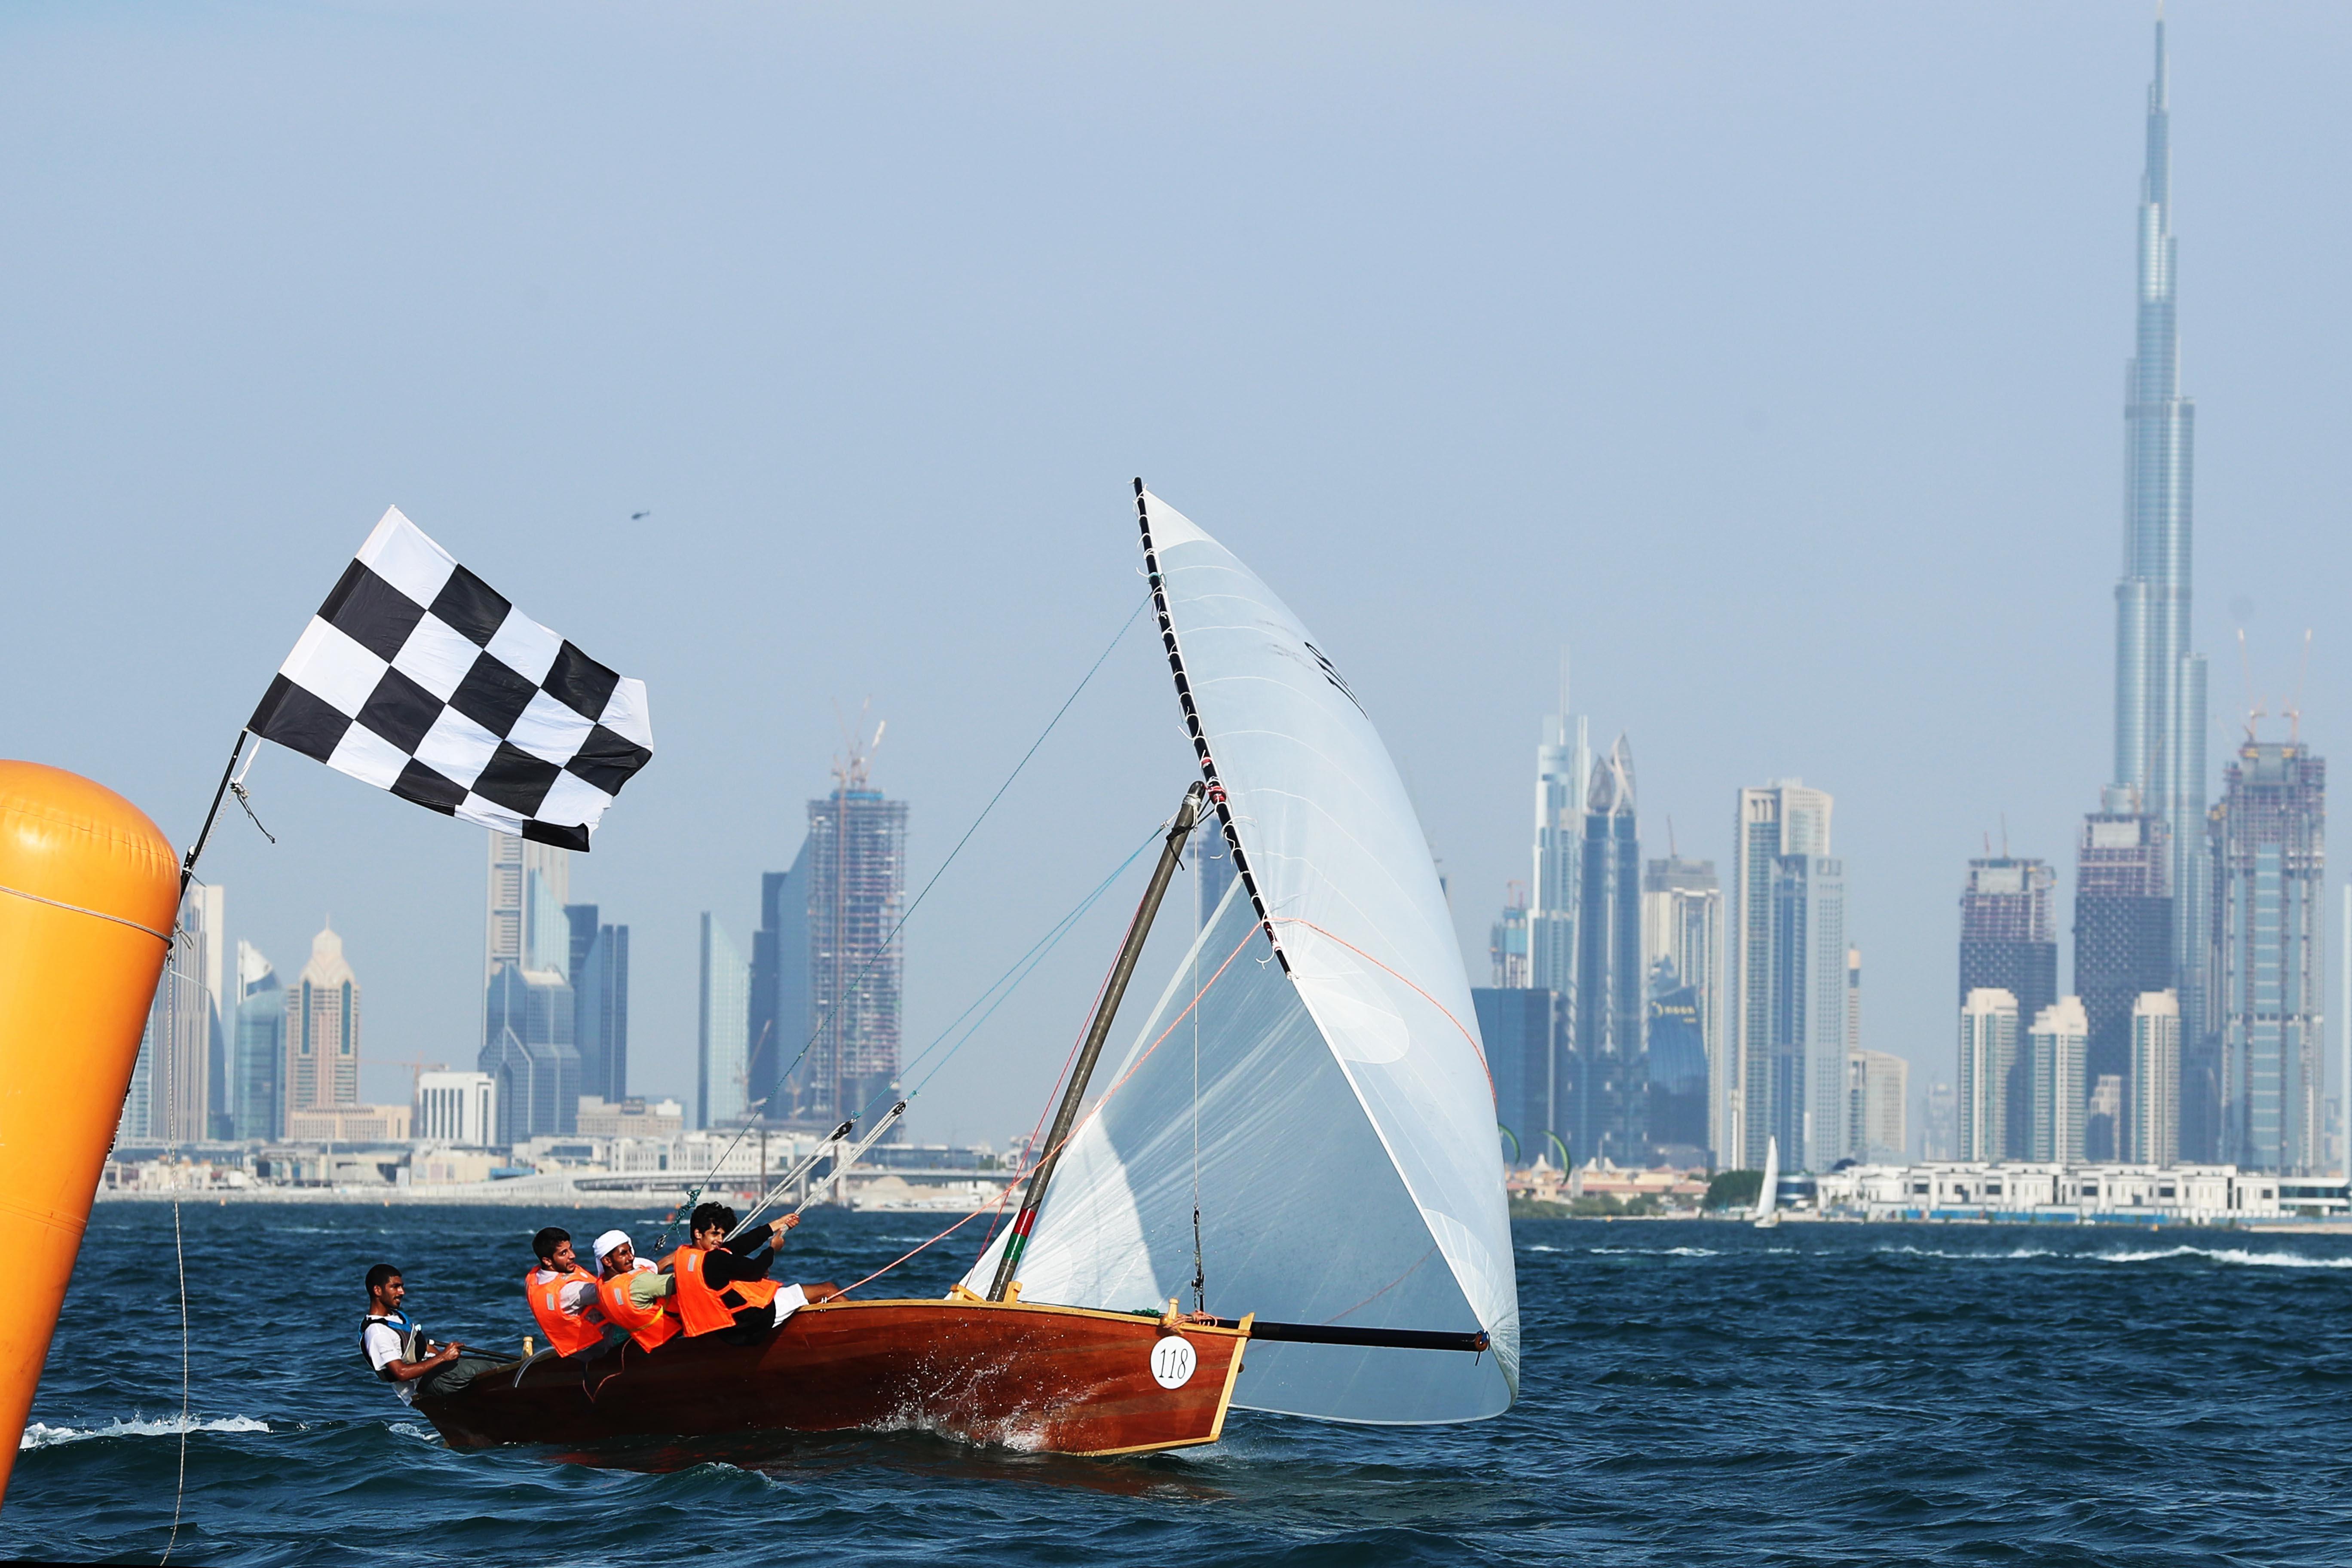 22ft Dhow Sailing Race kicks off today in Jumeirah